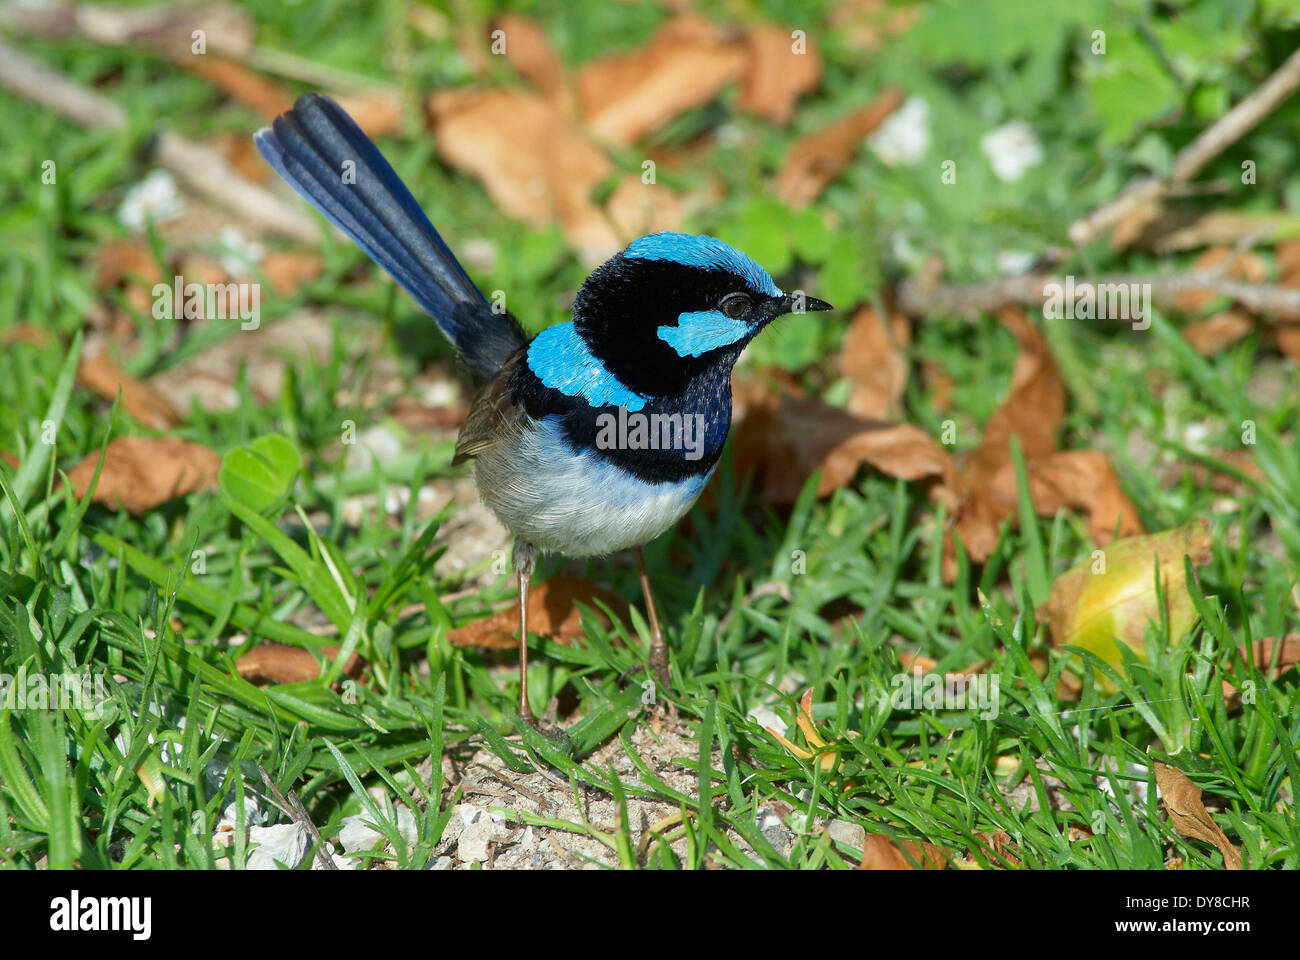 Australia, Fairy Wren, animal, Victoria, birds, Wilsons Promontory, national park, Physignathus Lesuerii, superb fairy wren, - Stock Image